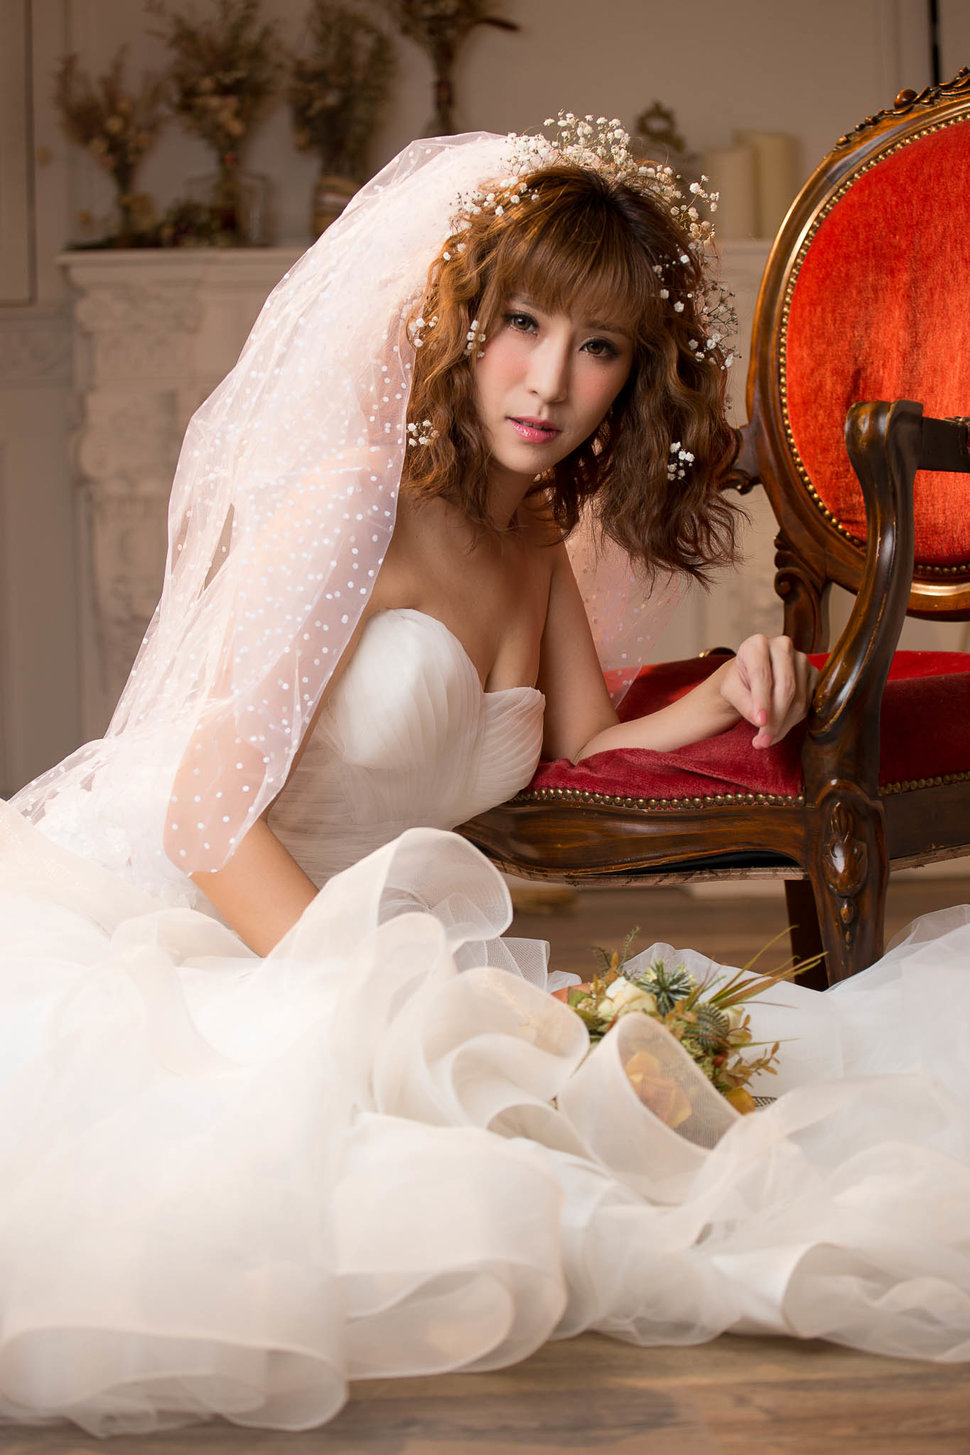 18PHOTO自主婚紗-潤兒(編號:406261) - 18PHOTO 婚紗影像攝影工作室 - 結婚吧一站式婚禮服務平台